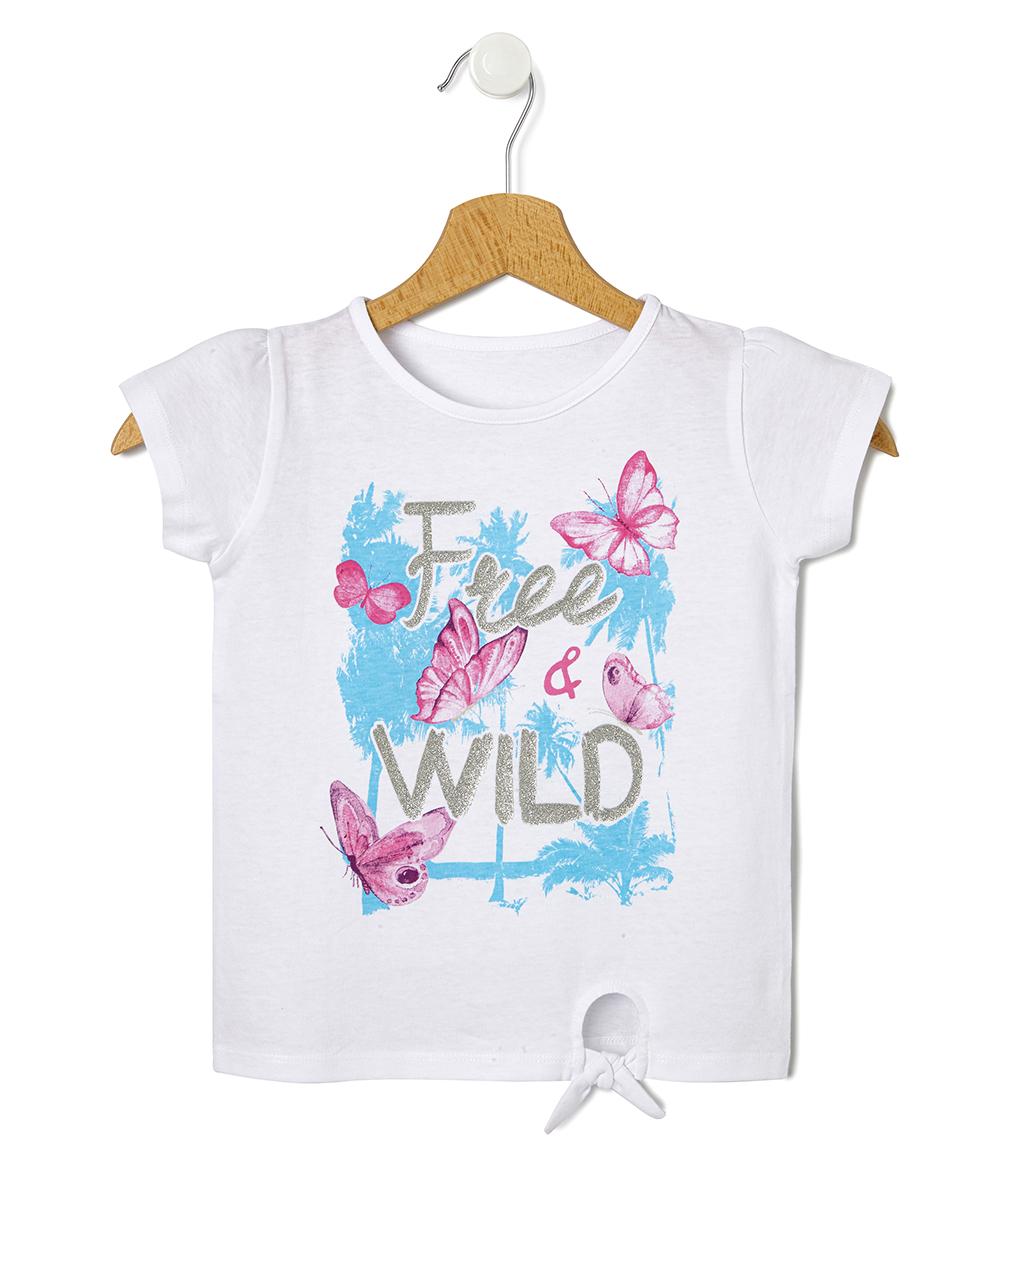 T-Shirt Jersey Λευκό με Στάμπα Πεταλούδες και Κόμπο για Κορίτσι